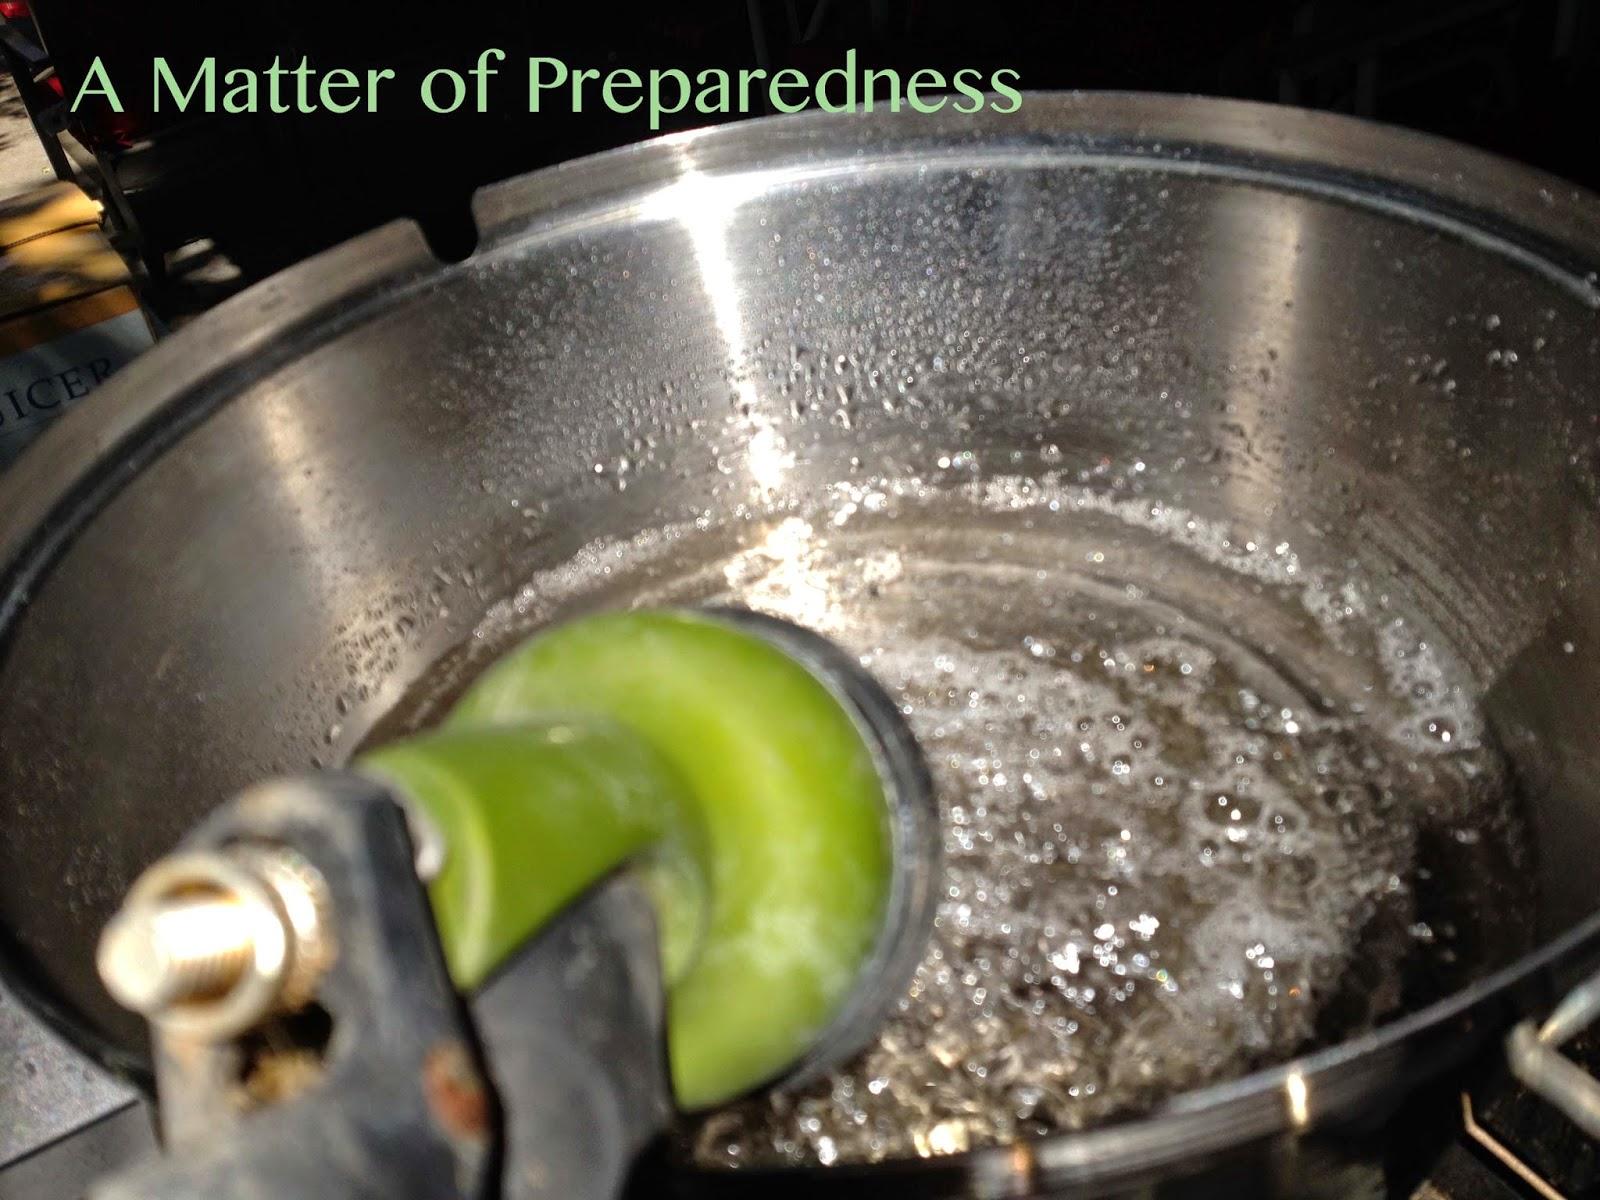 Making Apple Juice and Apple Sauce